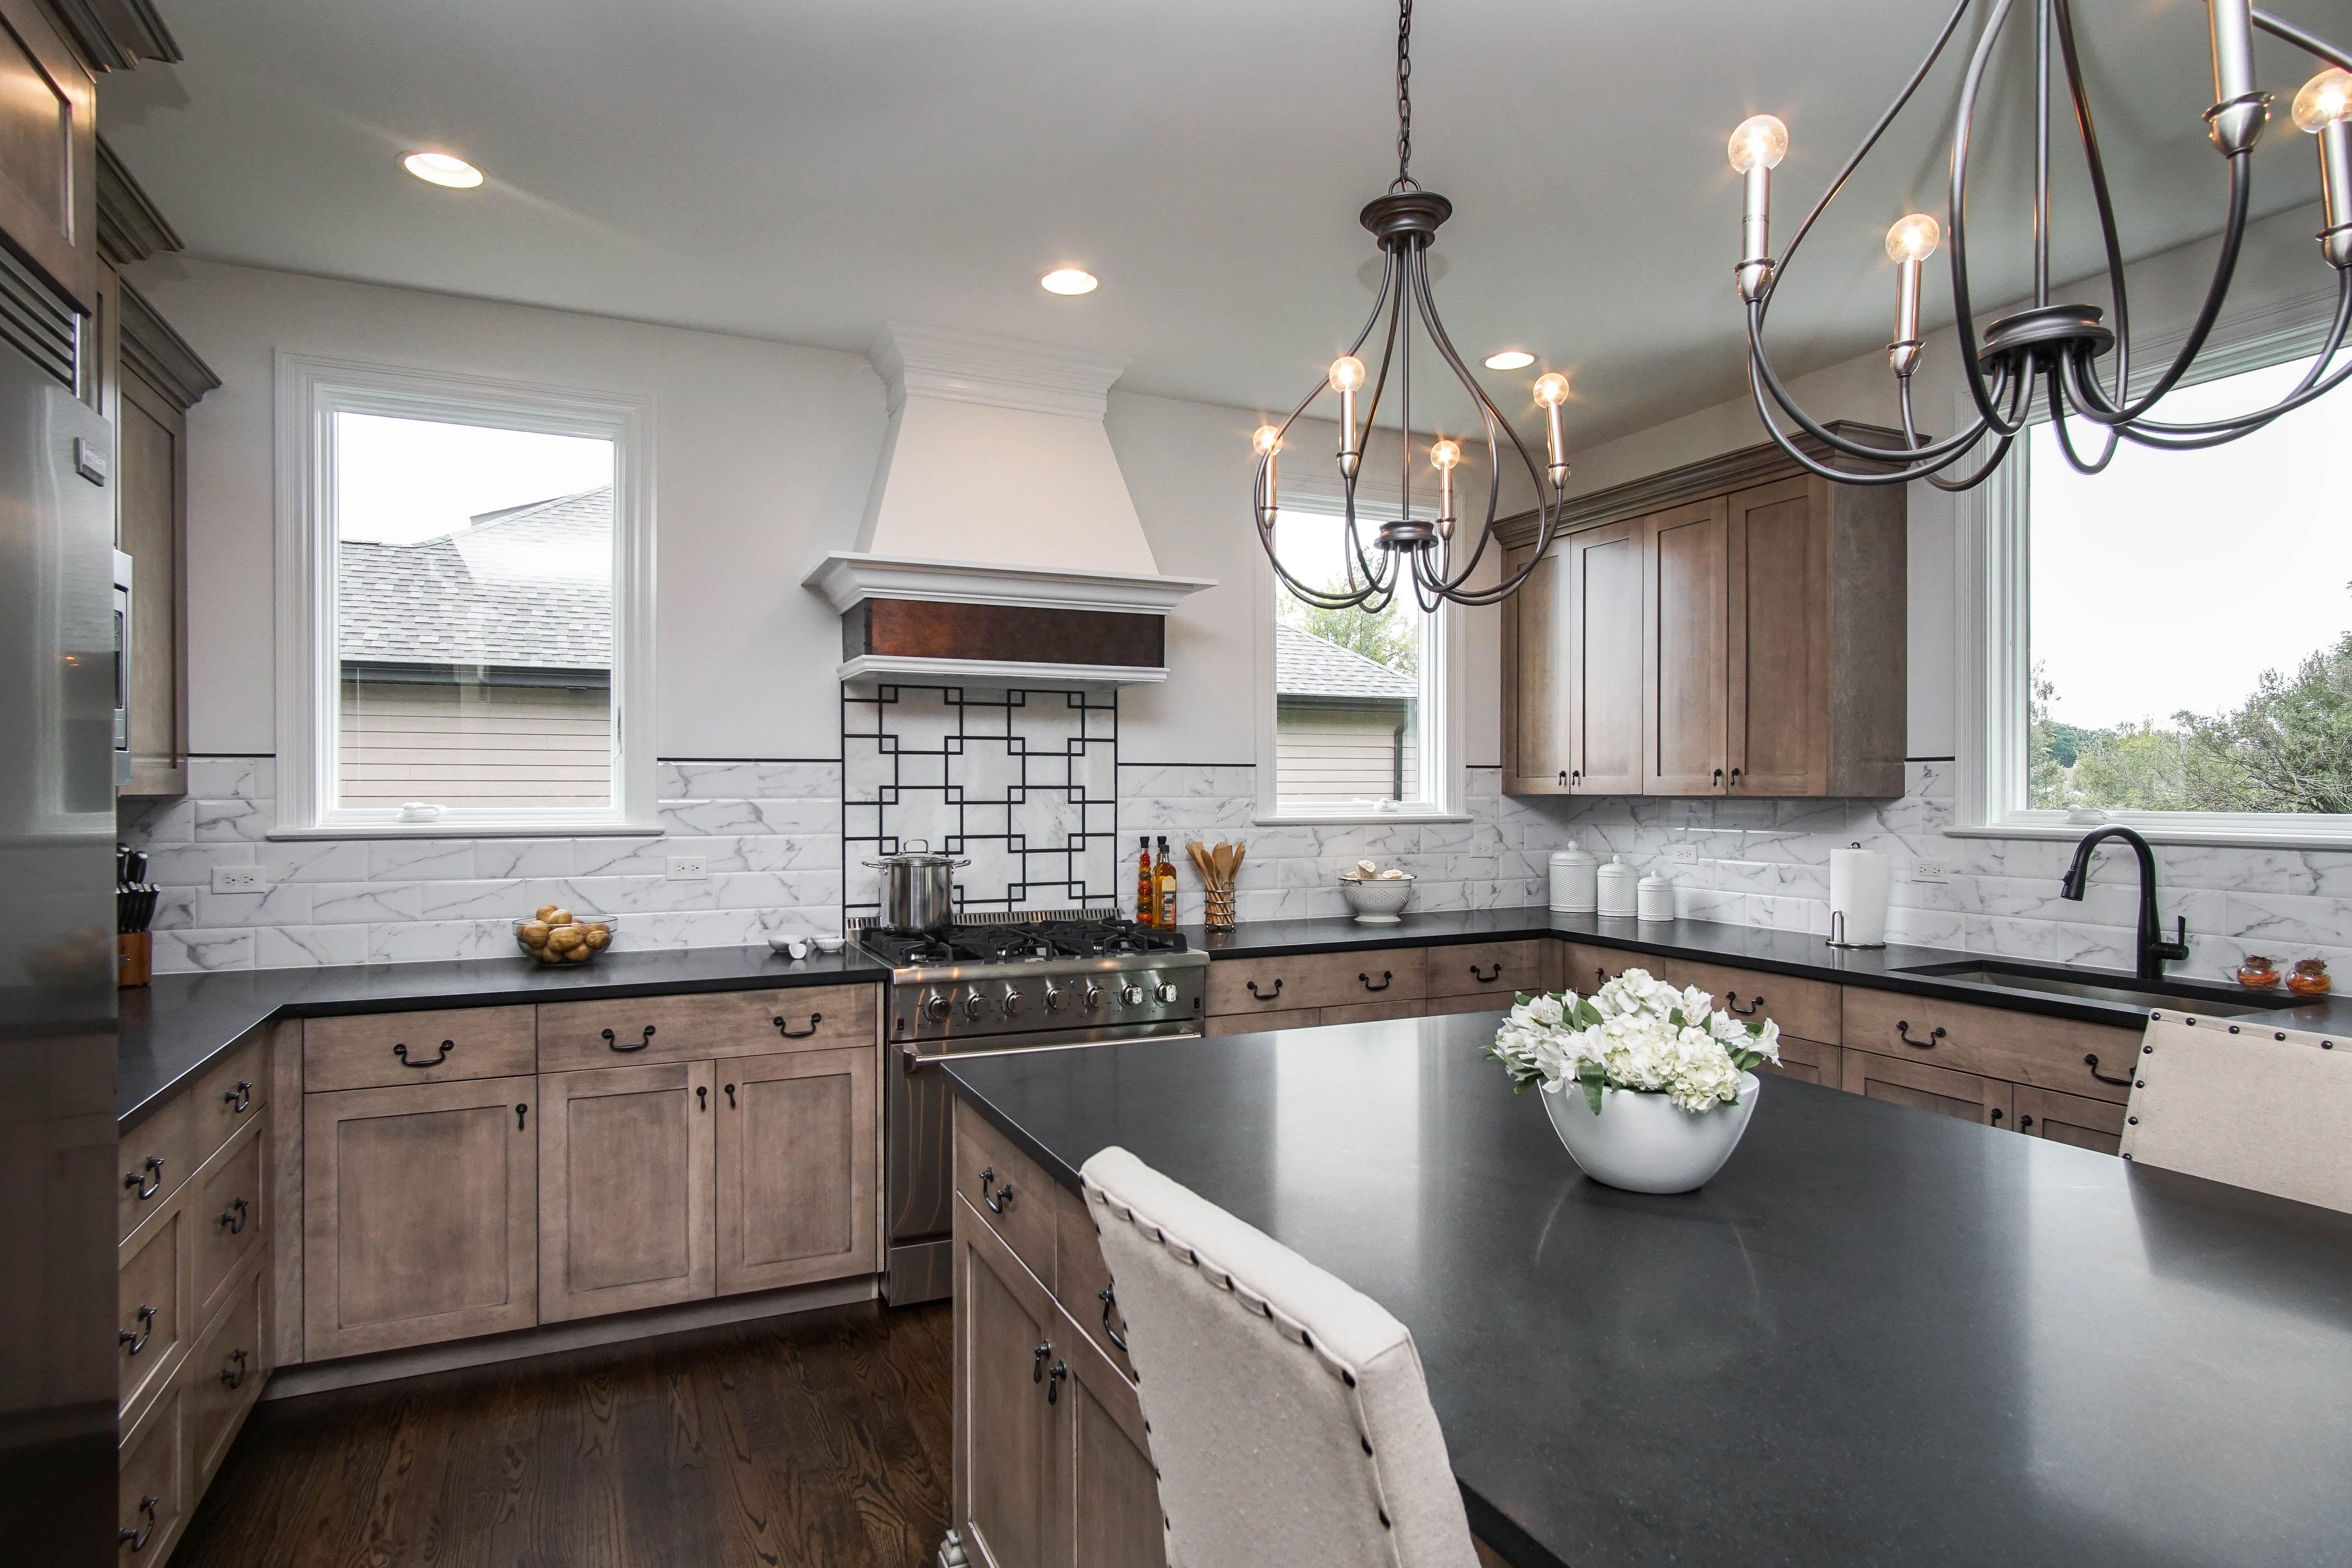 interesting marble backsplash kitchen walls | Sublime Homes created an elegant backsplash with our ...